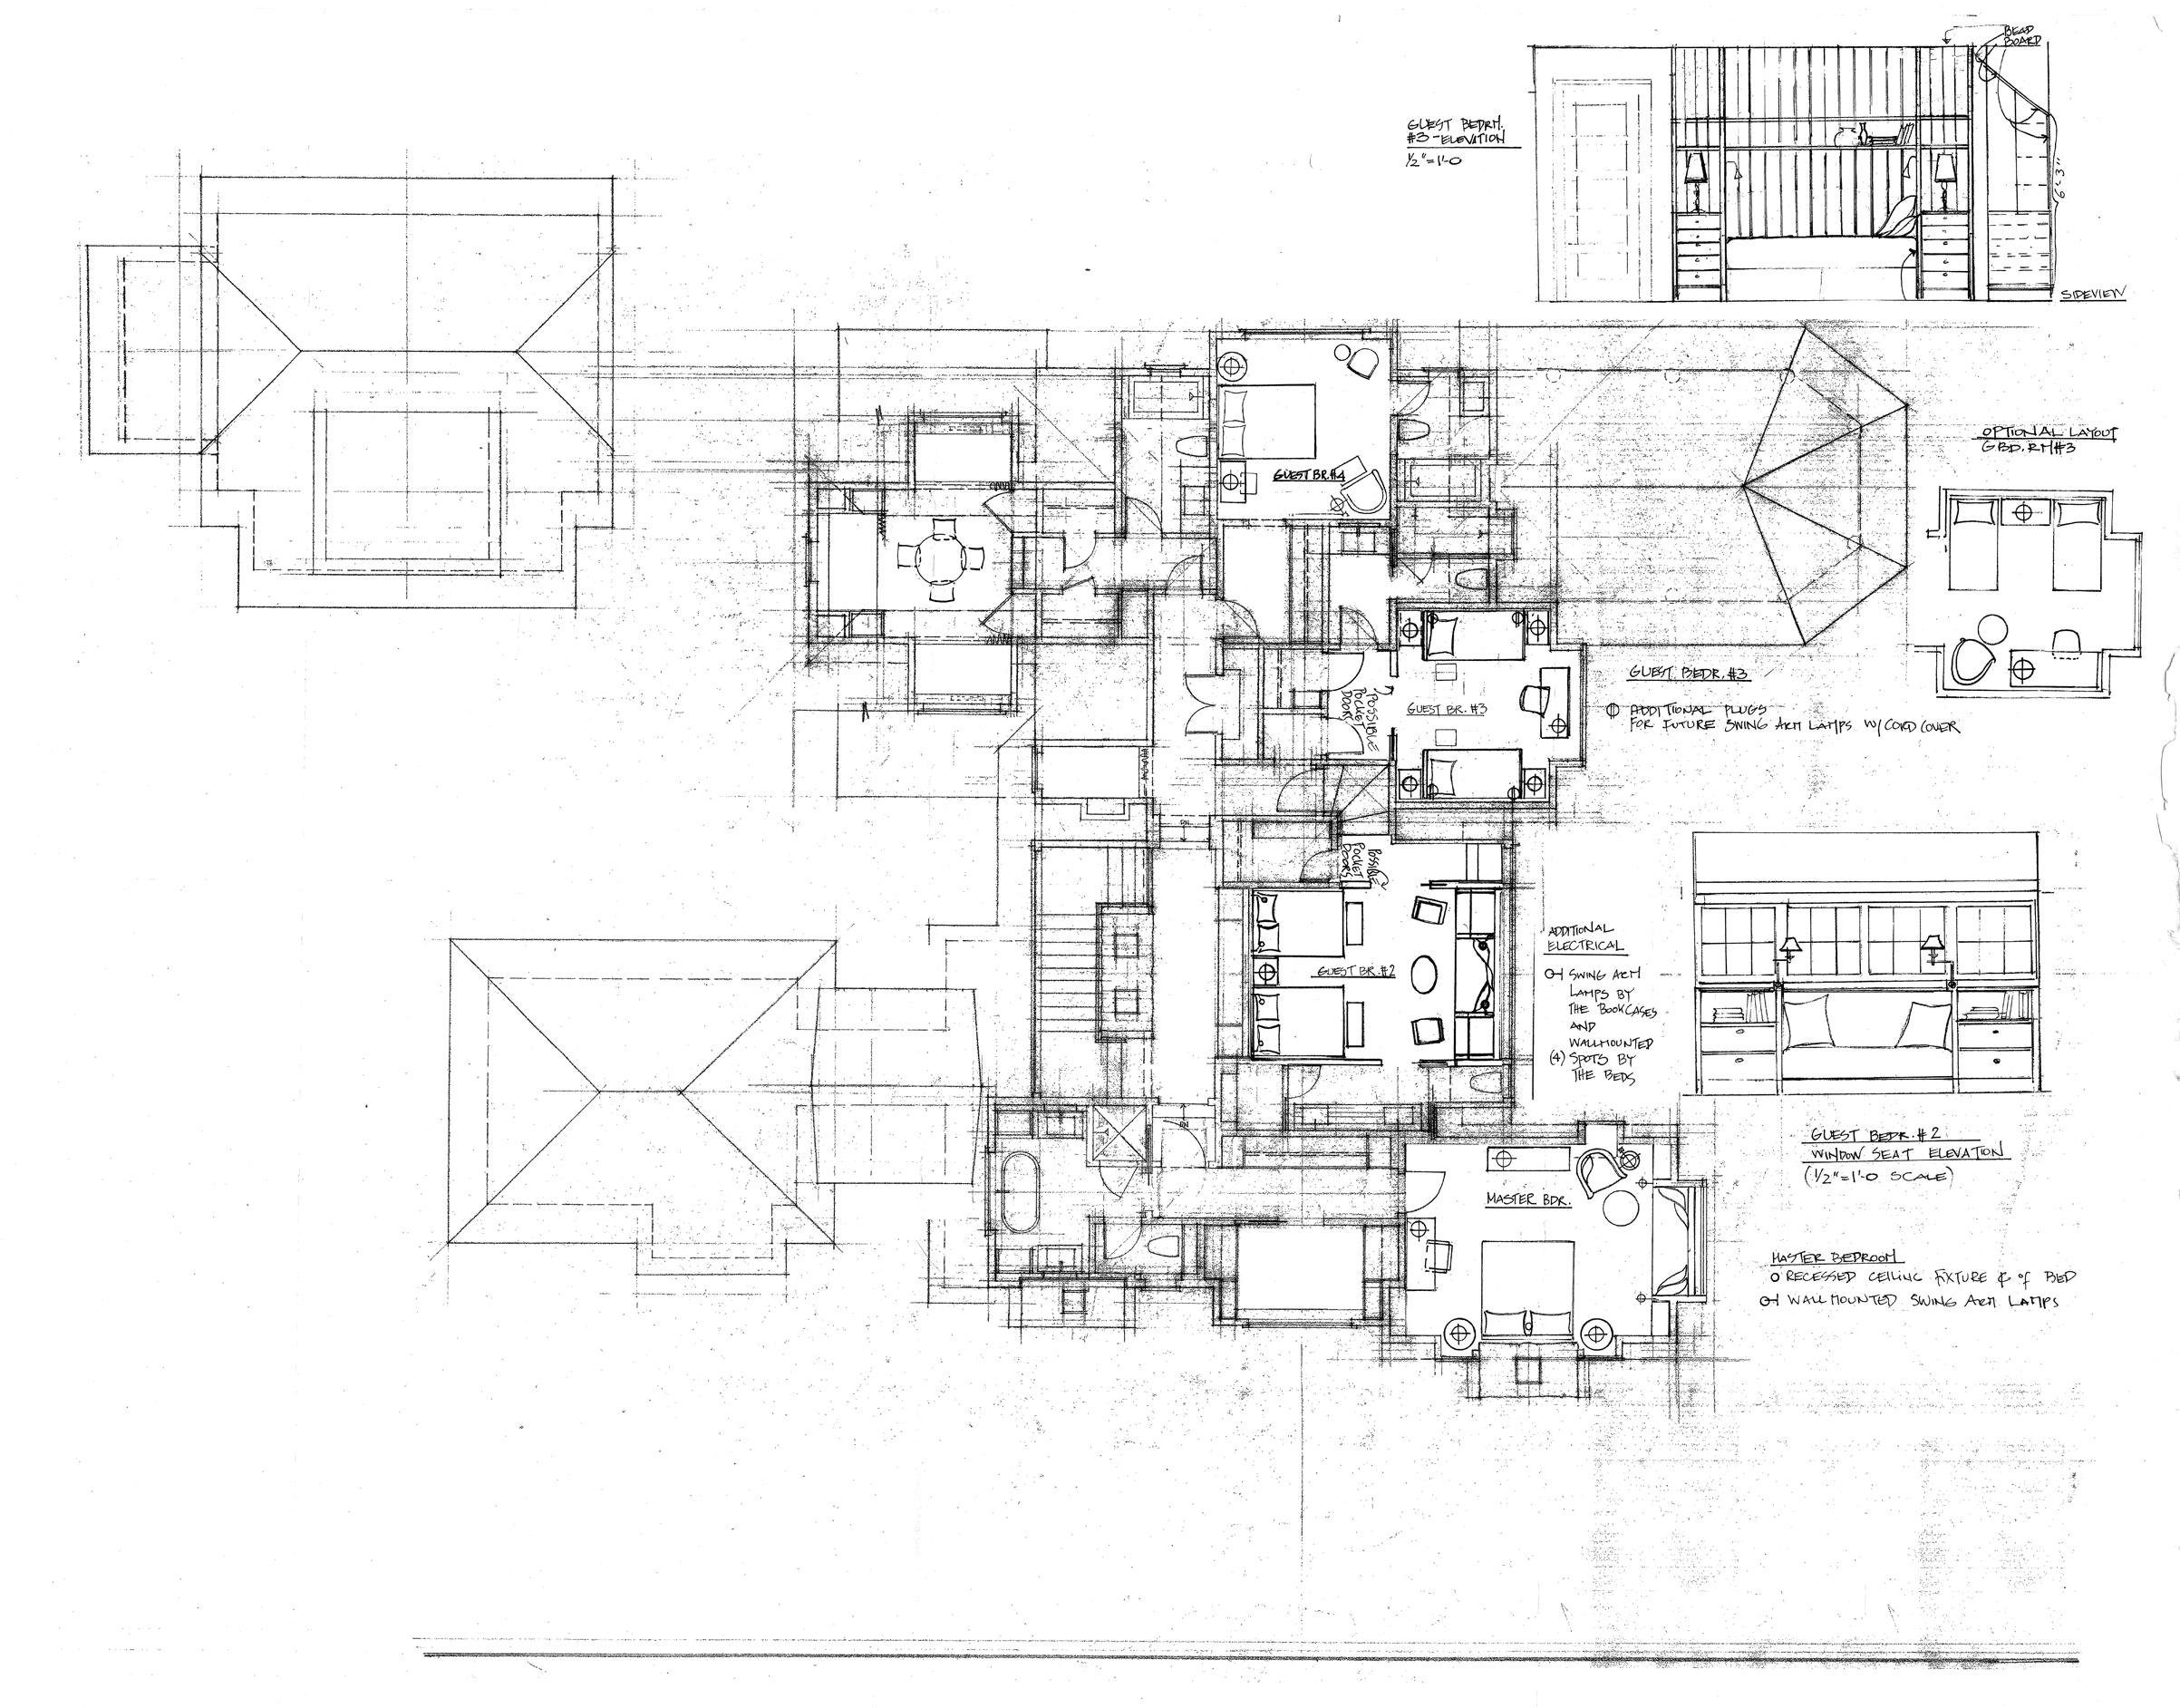 Lake_Placid.New_York.Lake_House.Robert_Orr_&_Associates.Architecture.Landscape_Architecture.Urbanism.Camp.Plan2.Barnes.jpg